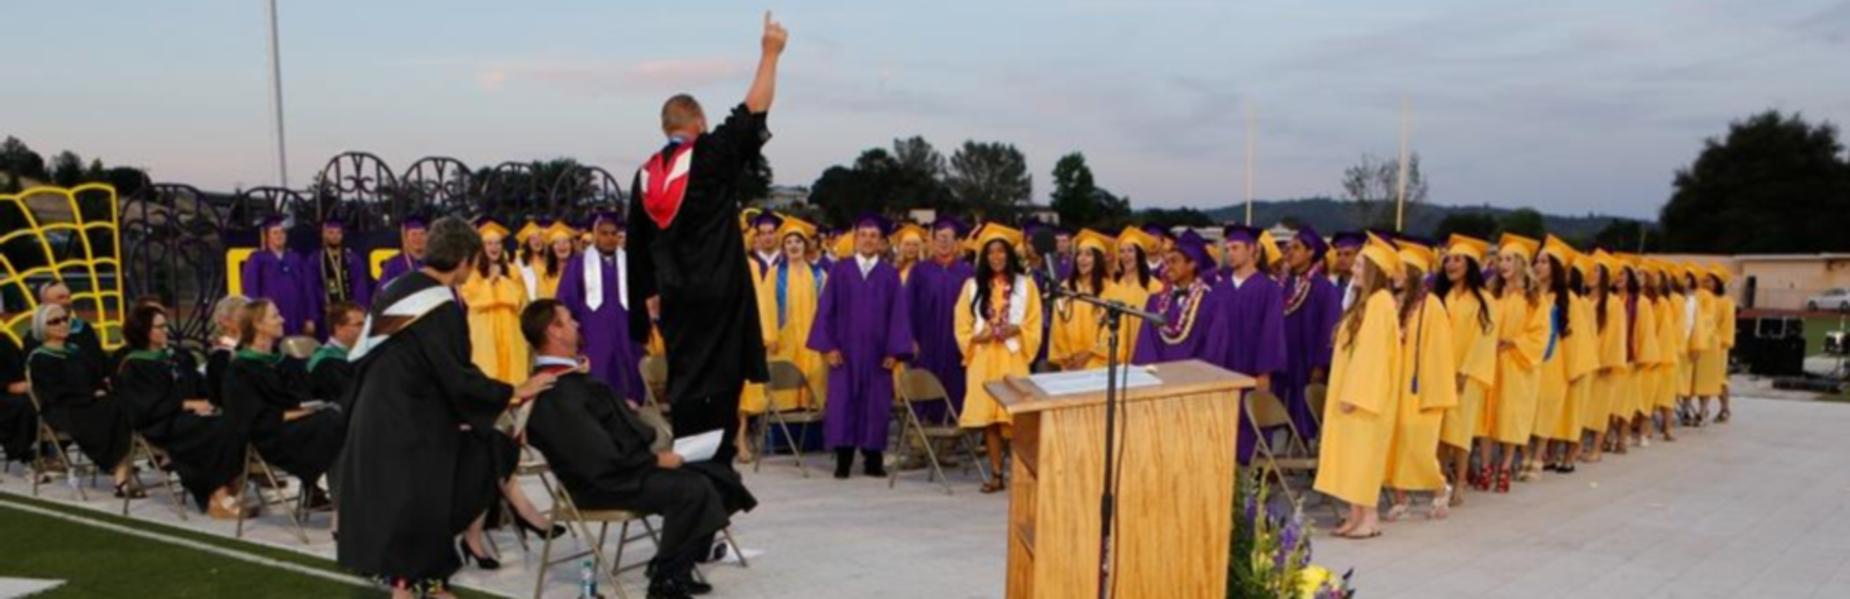 Bret Harte Graduation